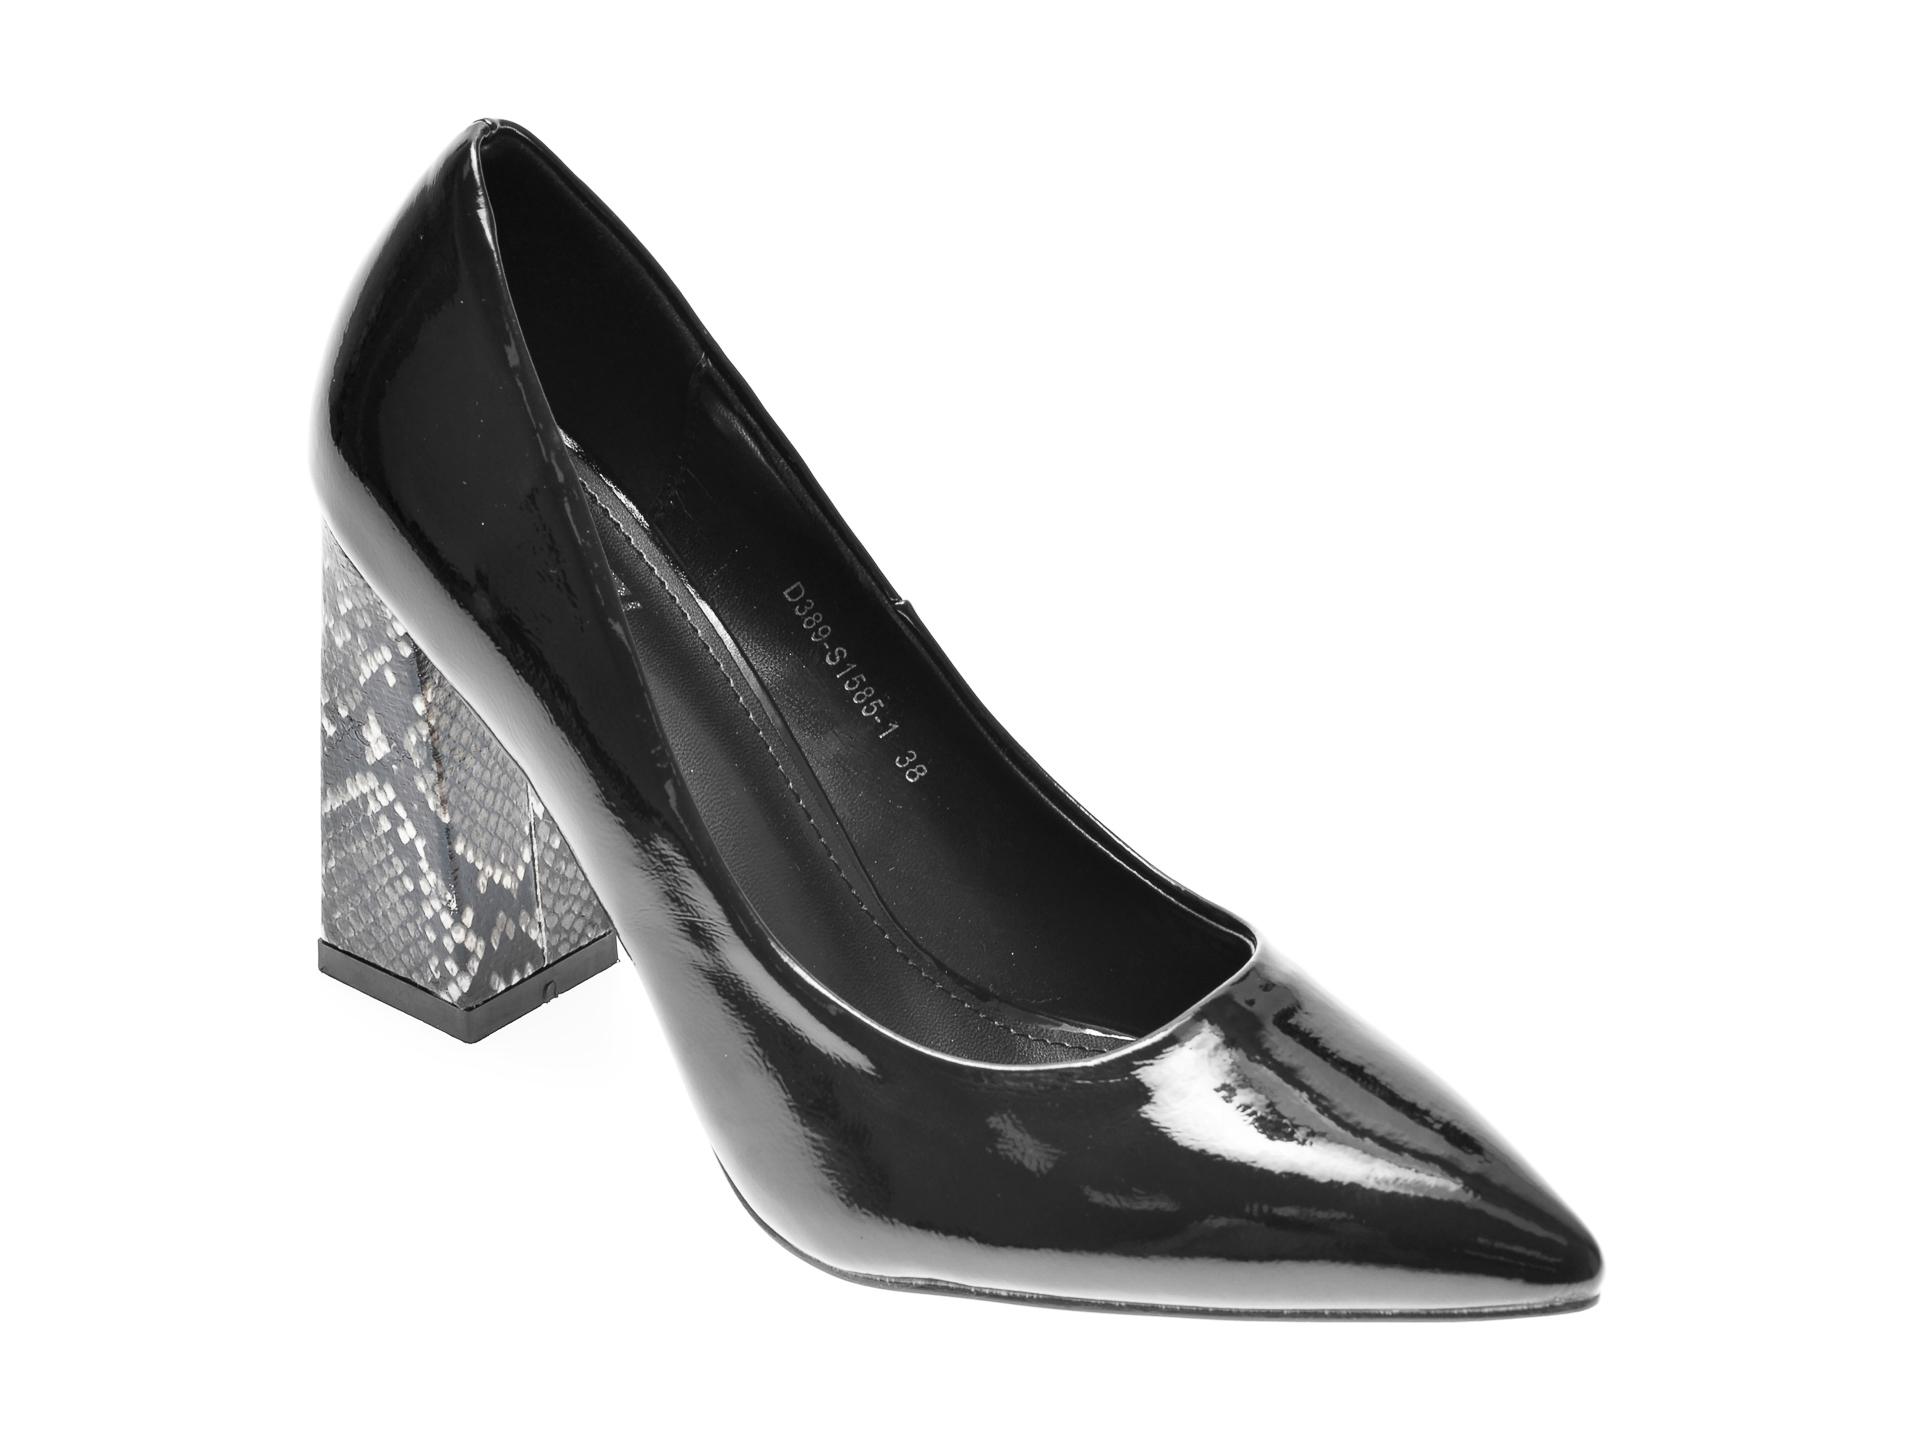 Pantofi RIO FIORE negri, S1585, din piele ecologica imagine